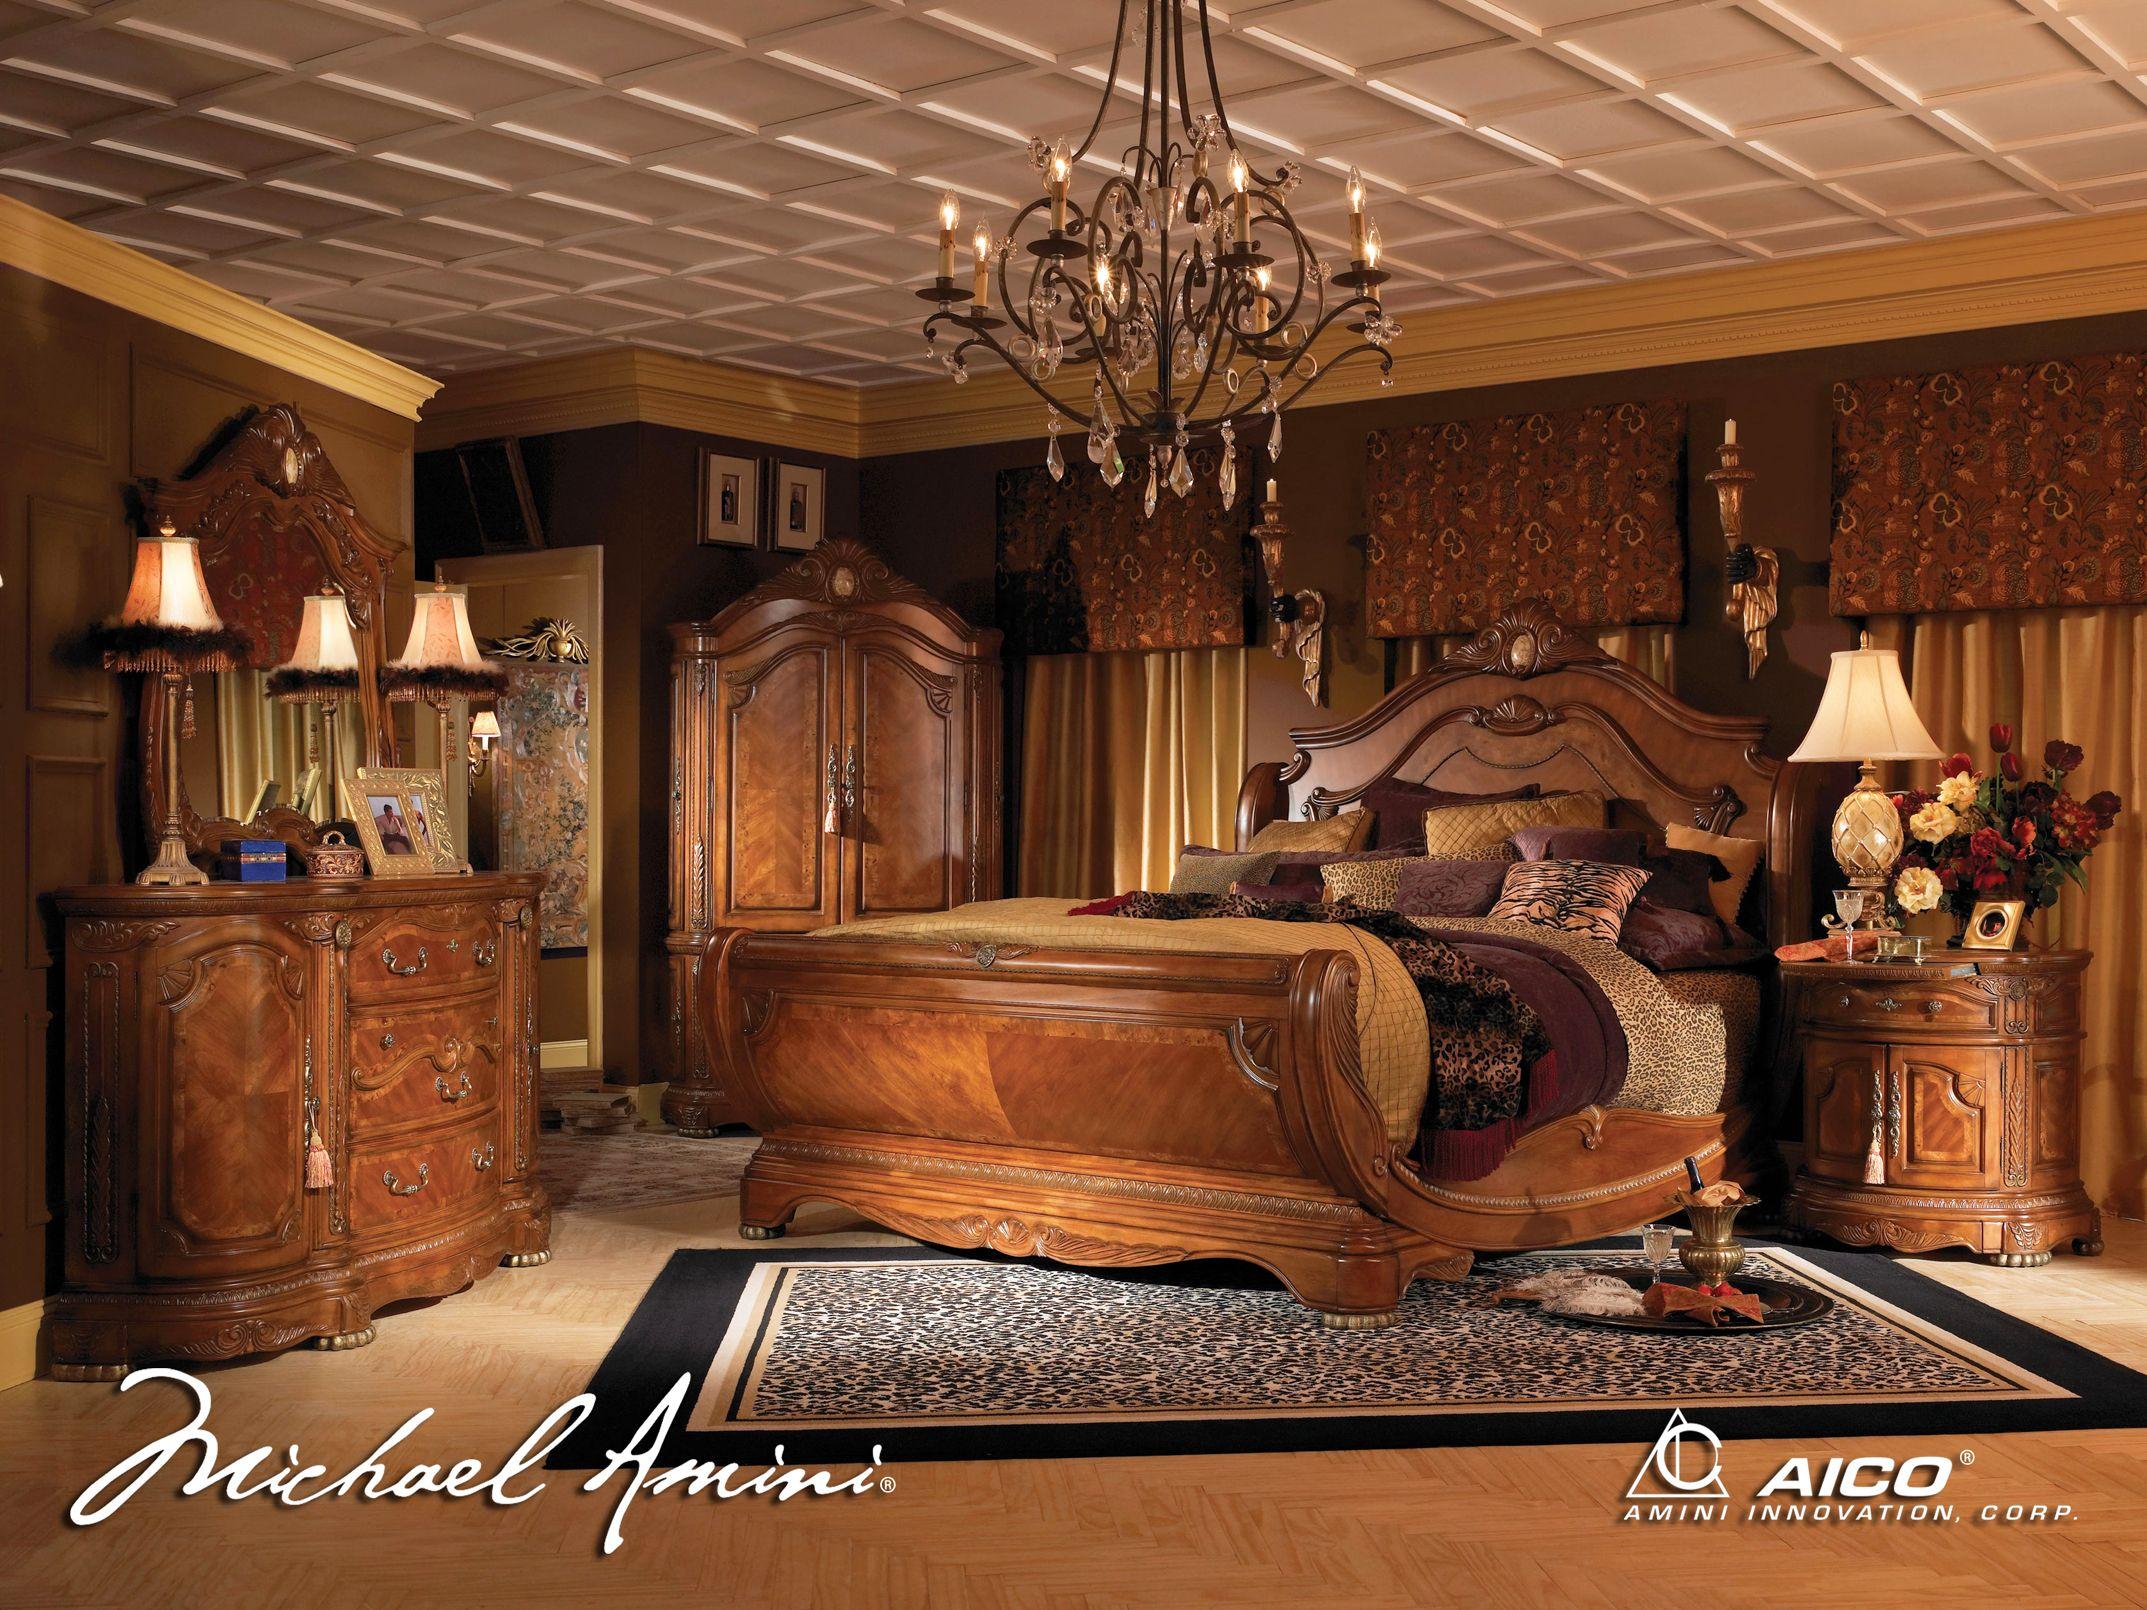 California King Size Bed Sets King Bedroom Sets Aico 5pc Cortina